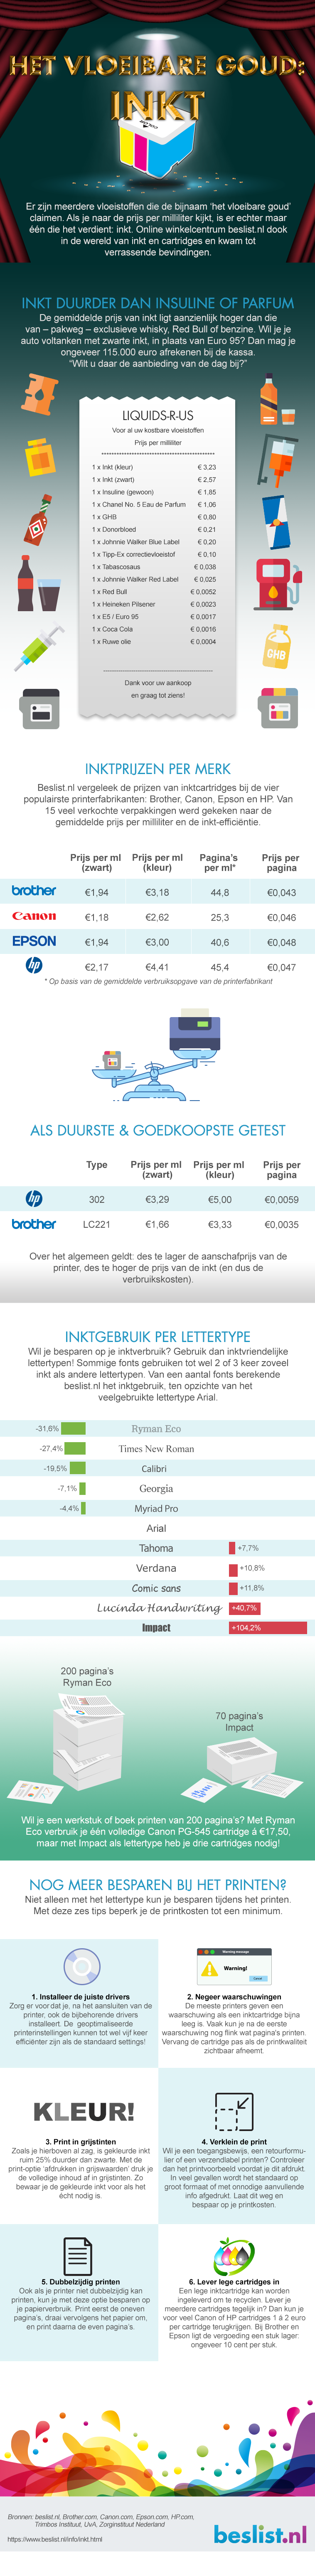 Infographic: Inkt